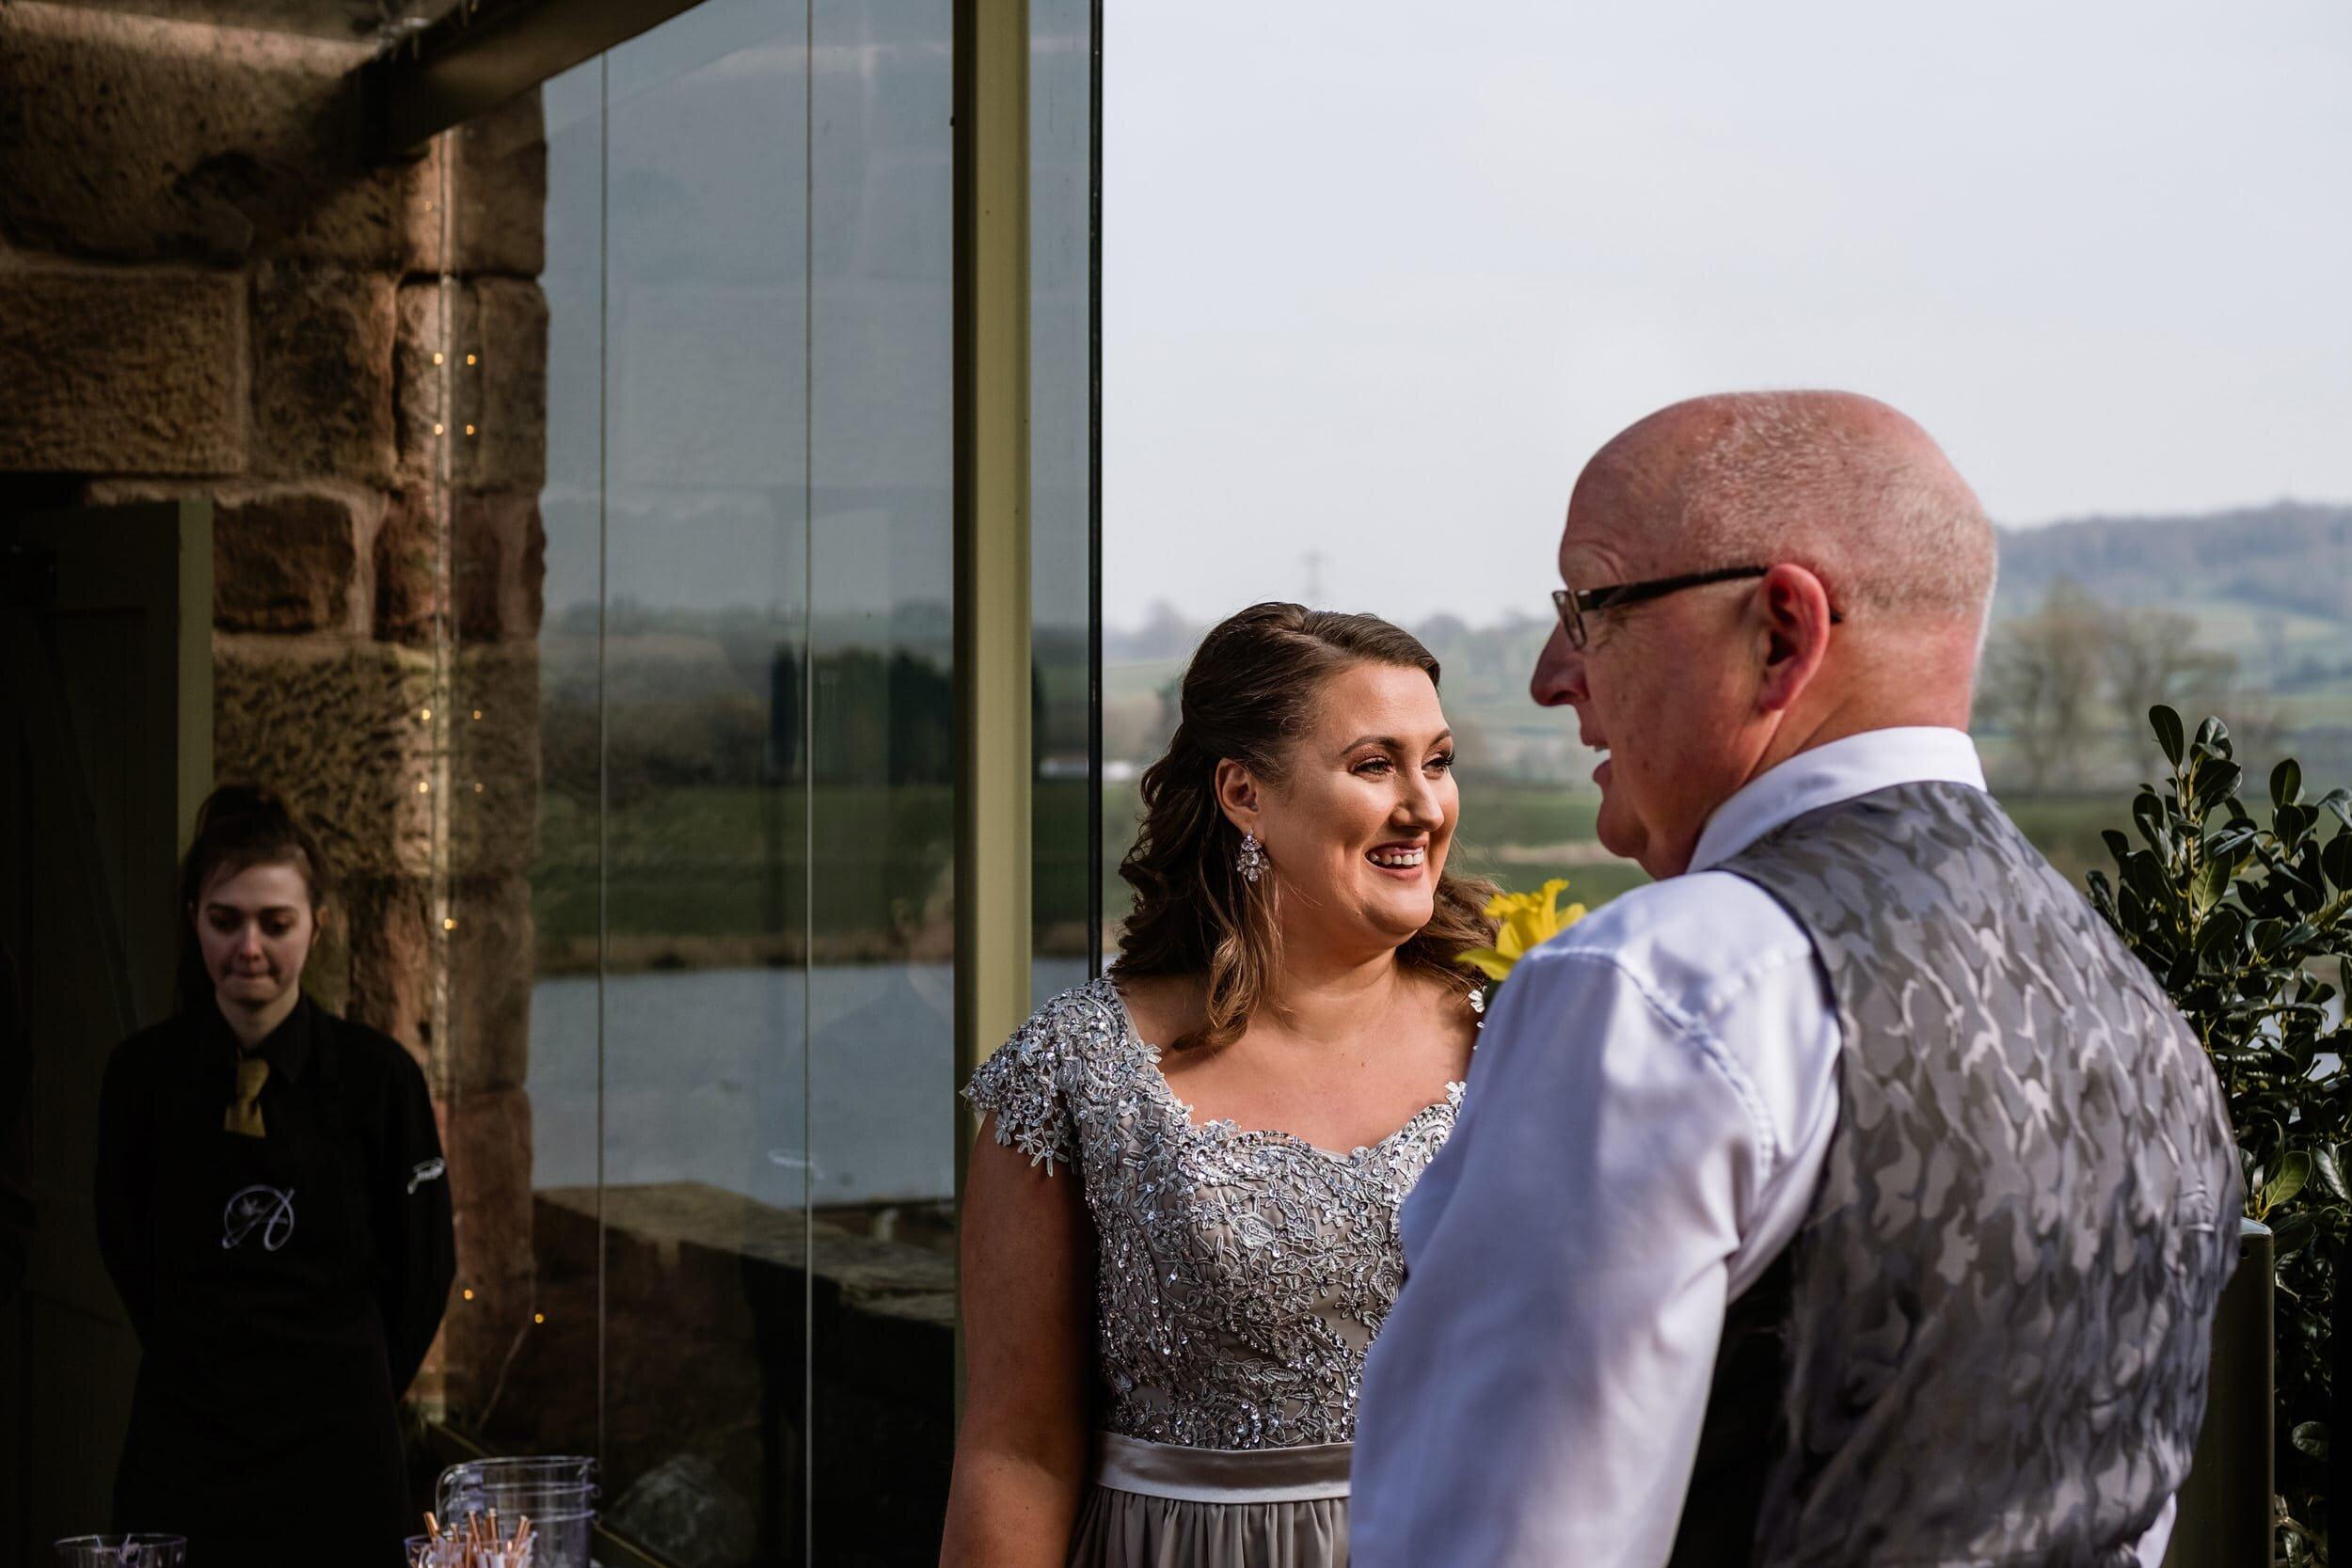 The Ashes Barns Wedding Photographer00133.jpg